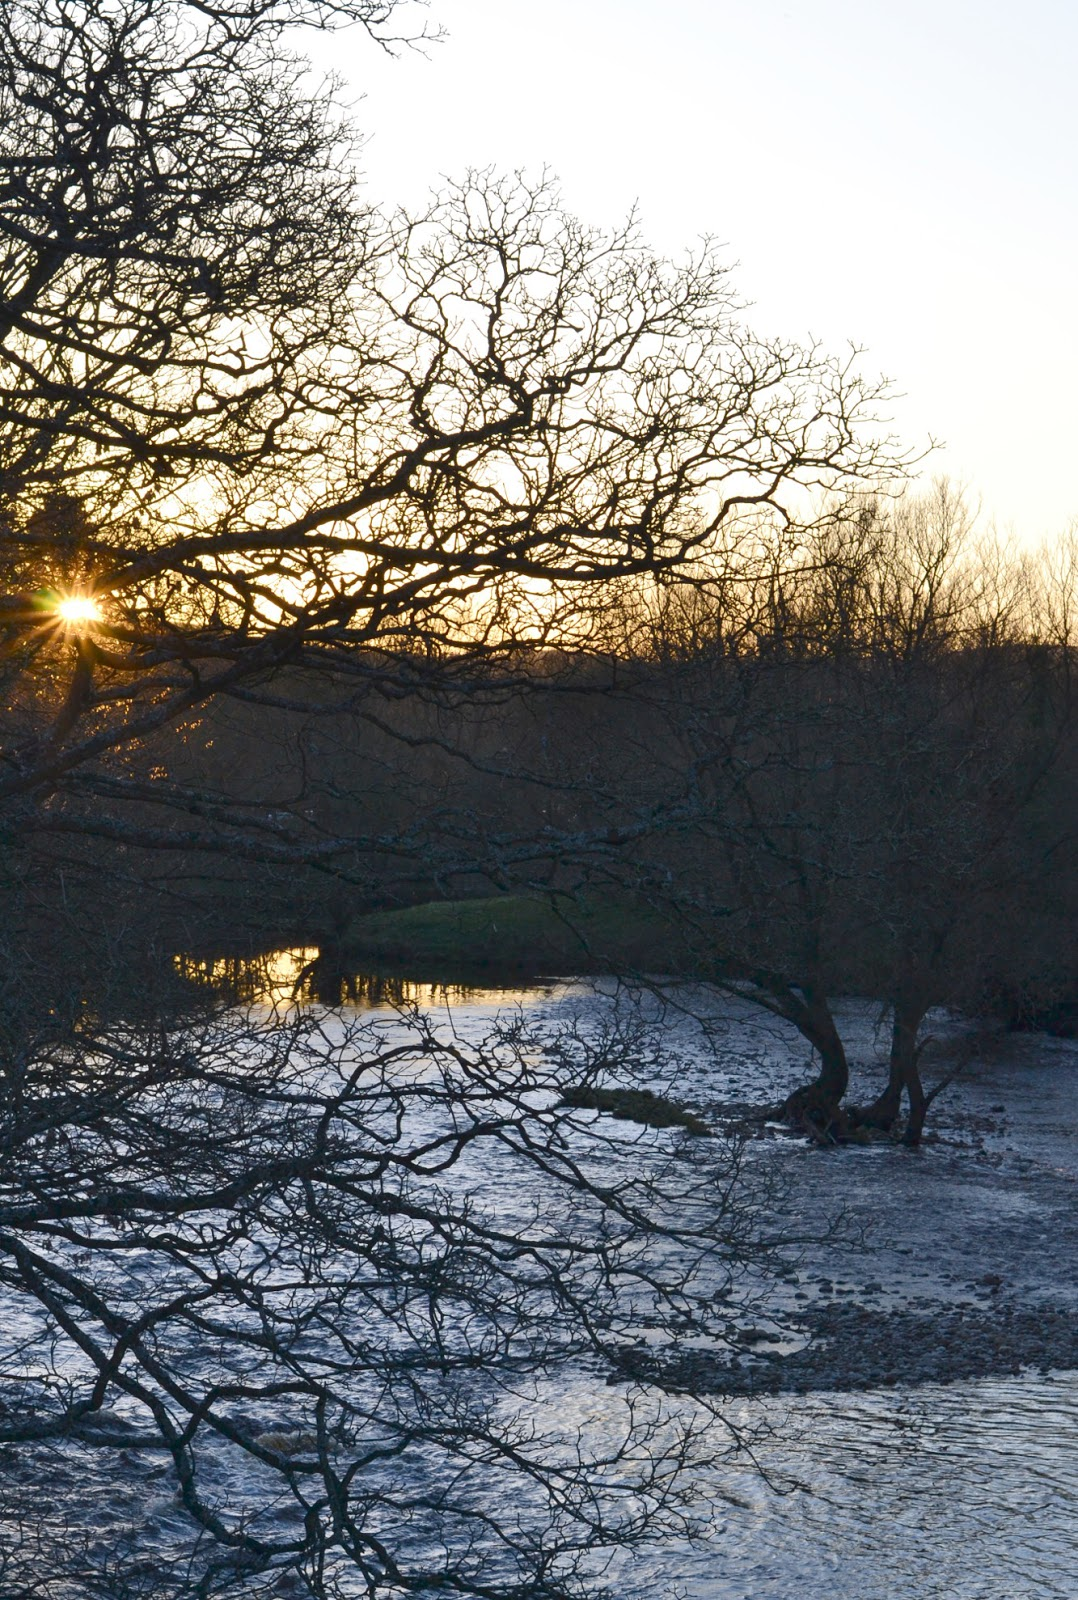 River Wharfe, Ilkley, Yorkshire